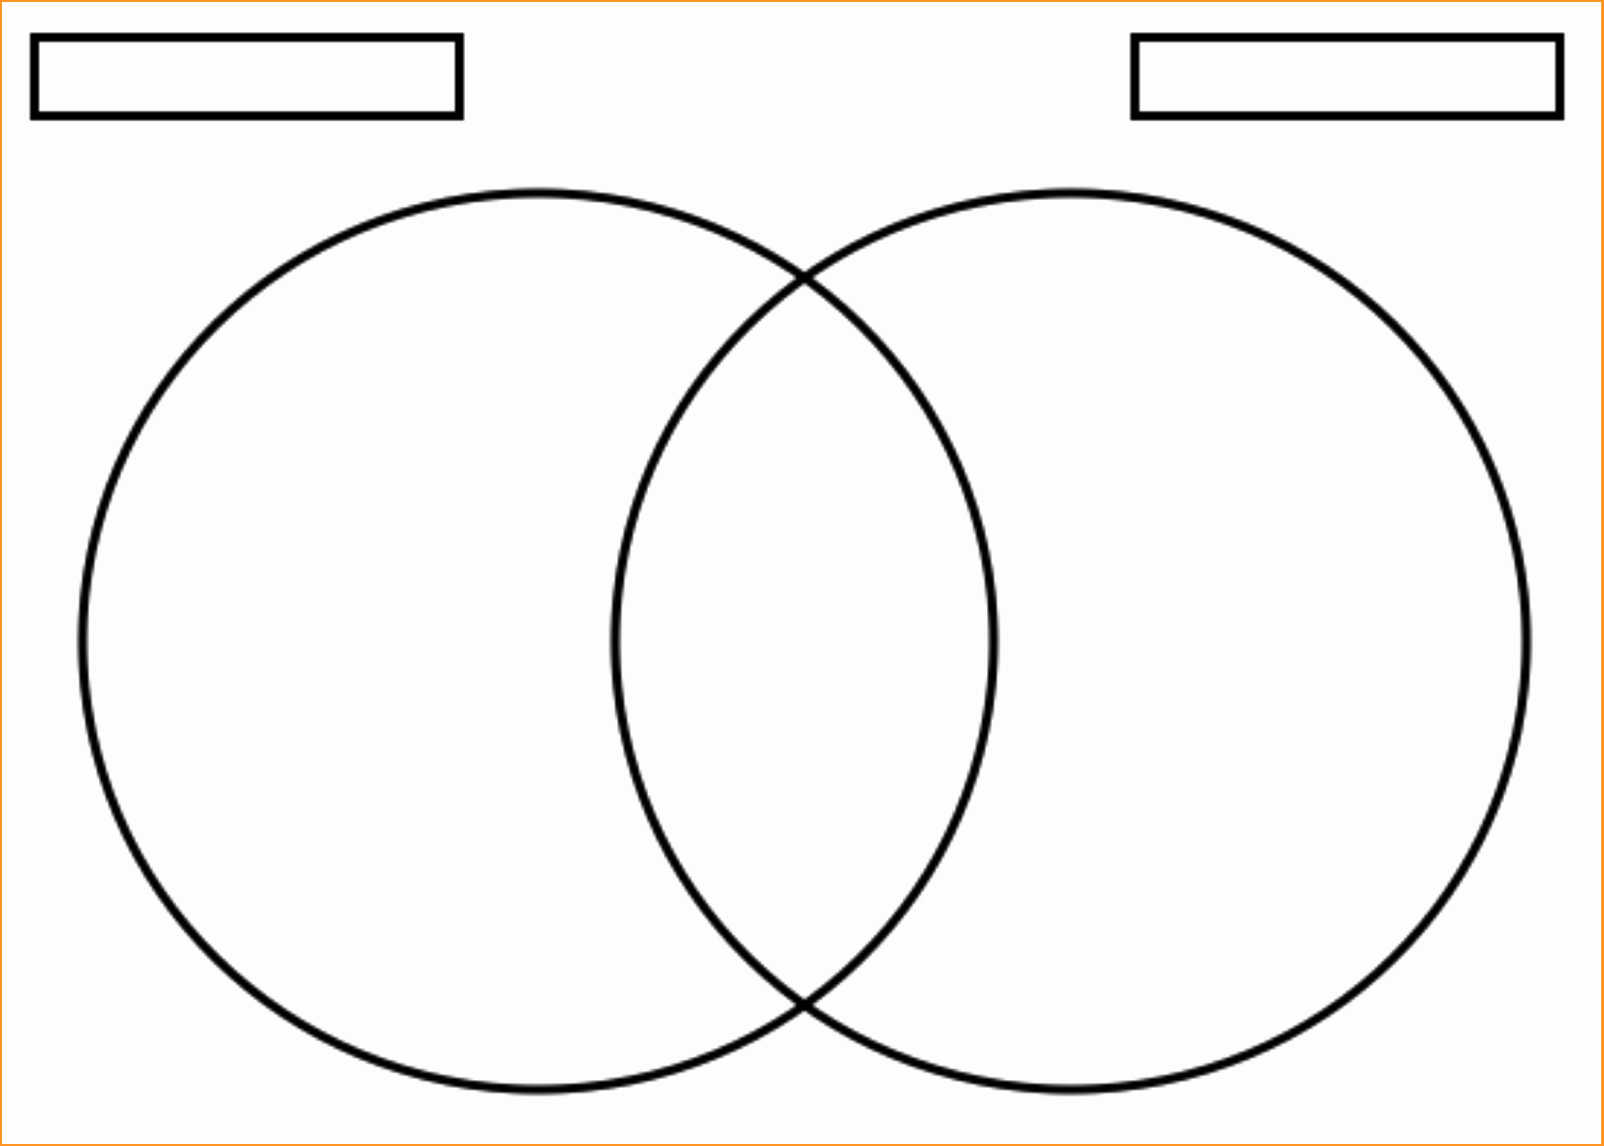 Venn Diagram Template Word Inspirational Venn Diagram Template 40 Free Venn Diagram Templates Word Pdf Template Lab by